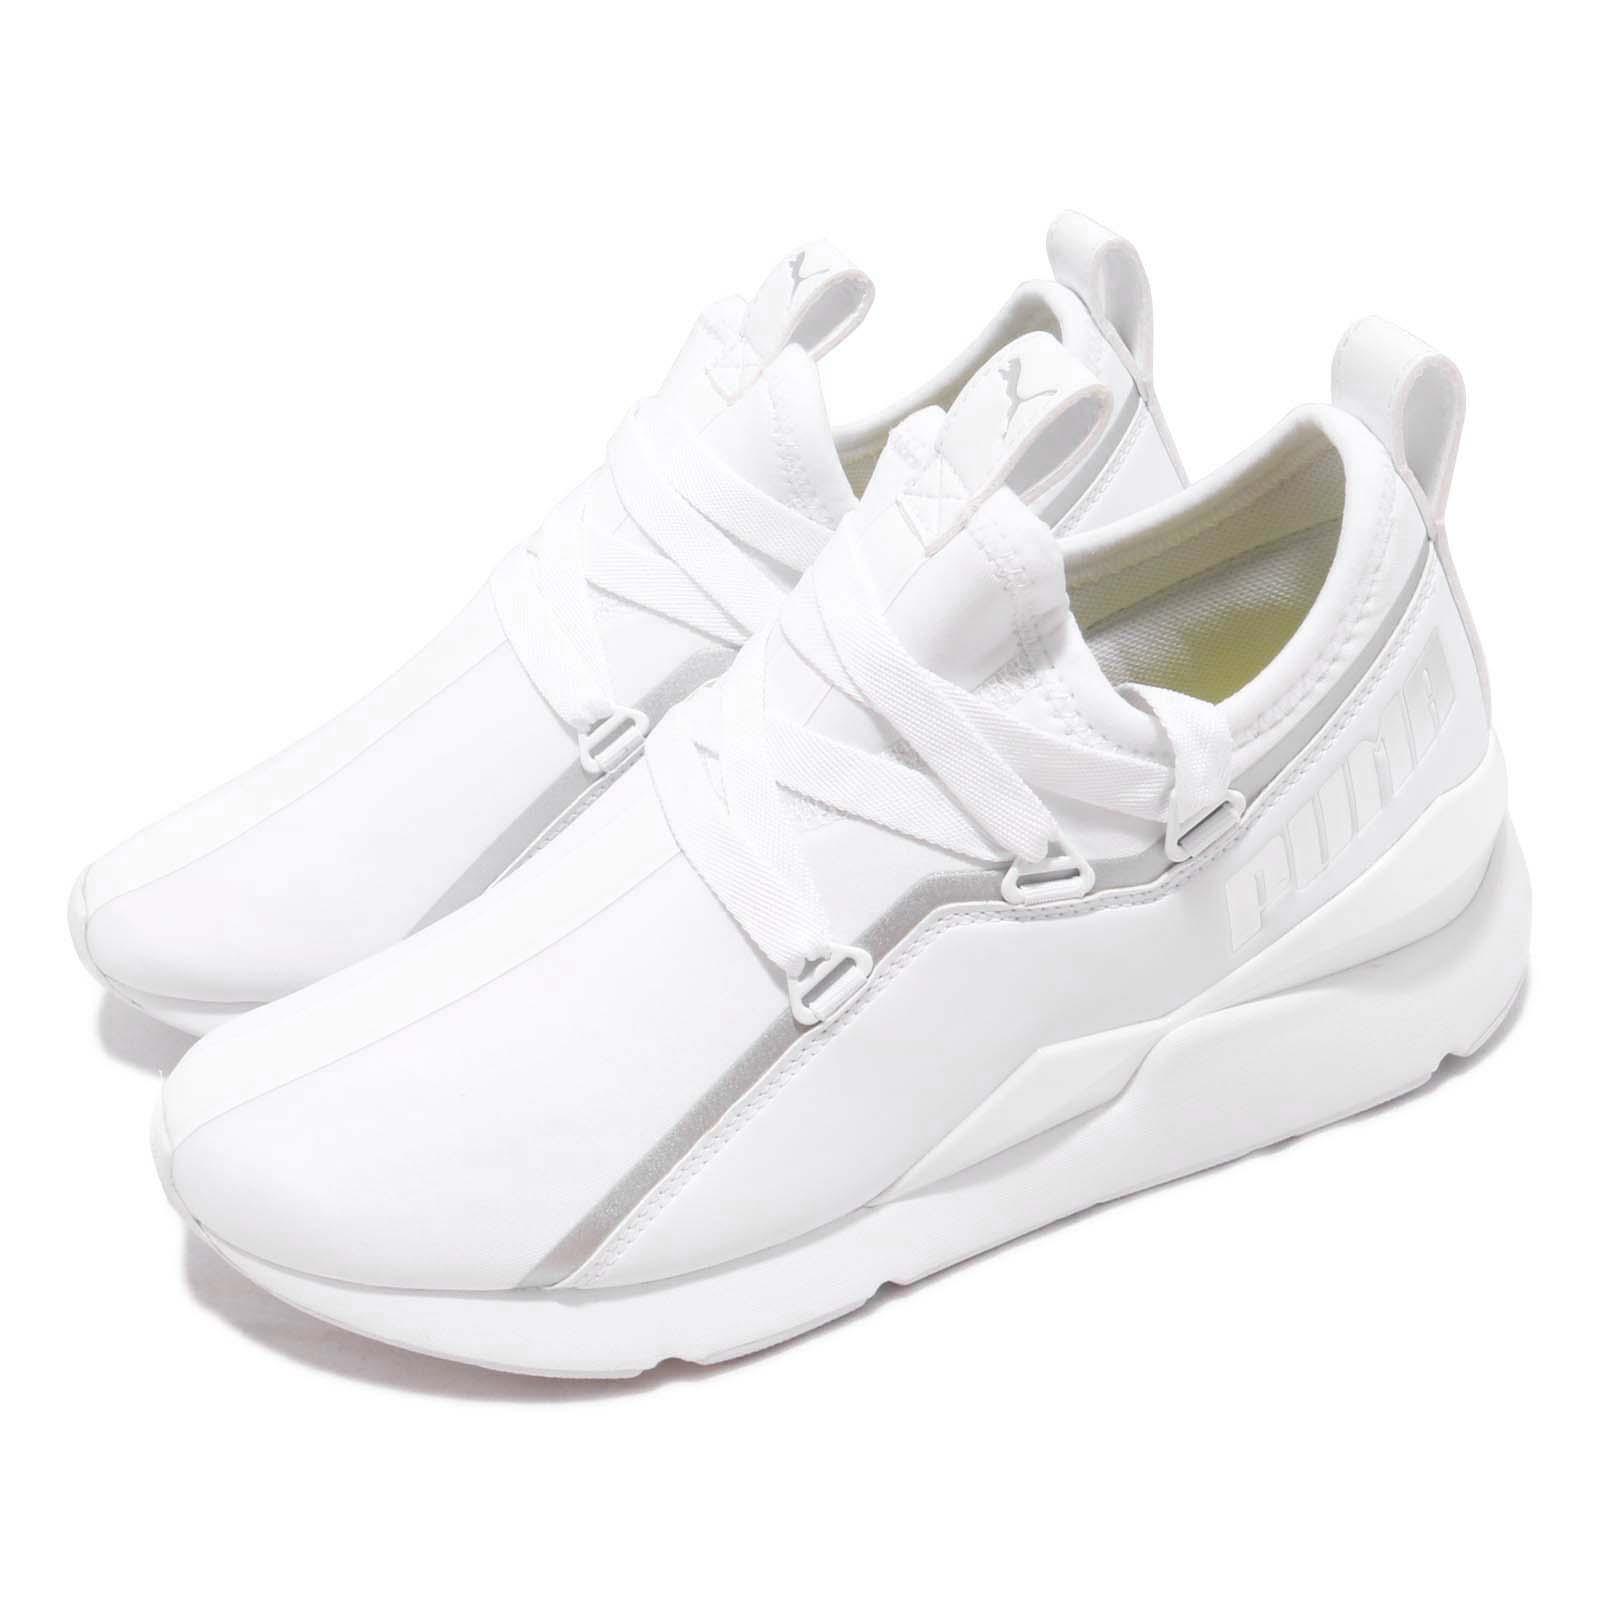 Puma 休閒鞋 Muse 2 TZ 襪套 運動 女鞋 36921102